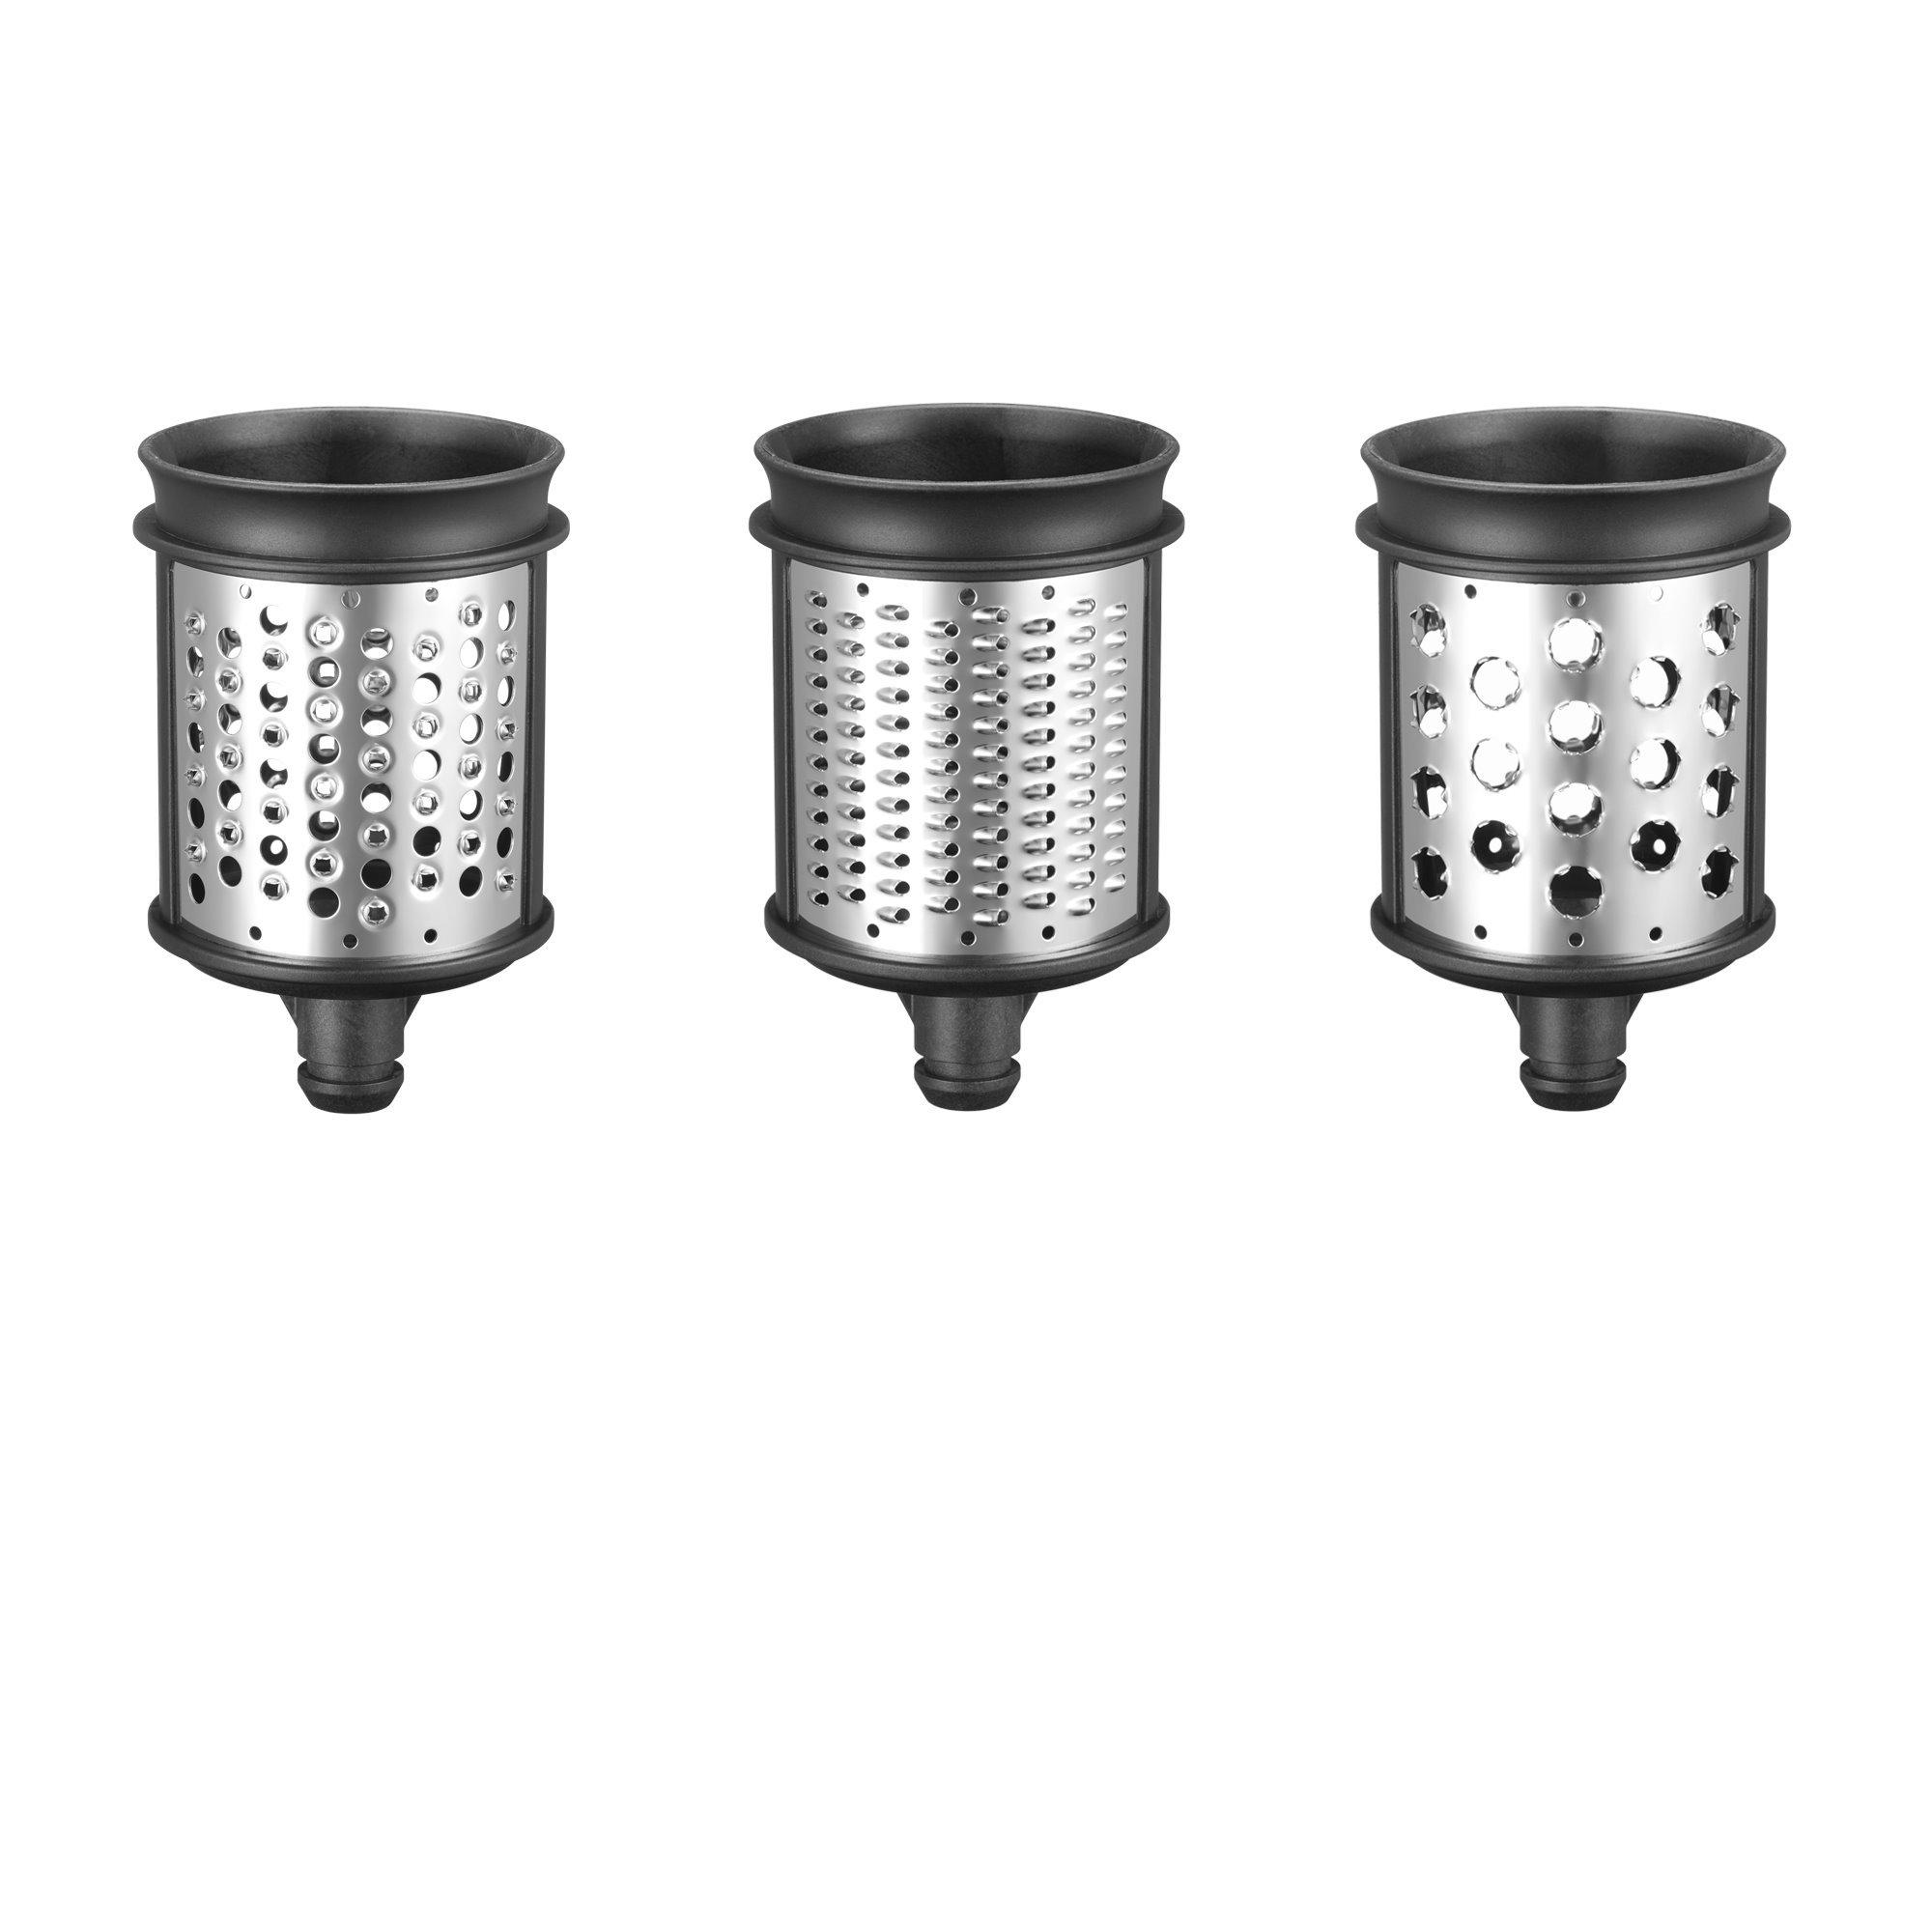 Set 3 cilindri pentru feliat si maruntit legume 5KSMEMVSC, Silver, KitchenAid imagine